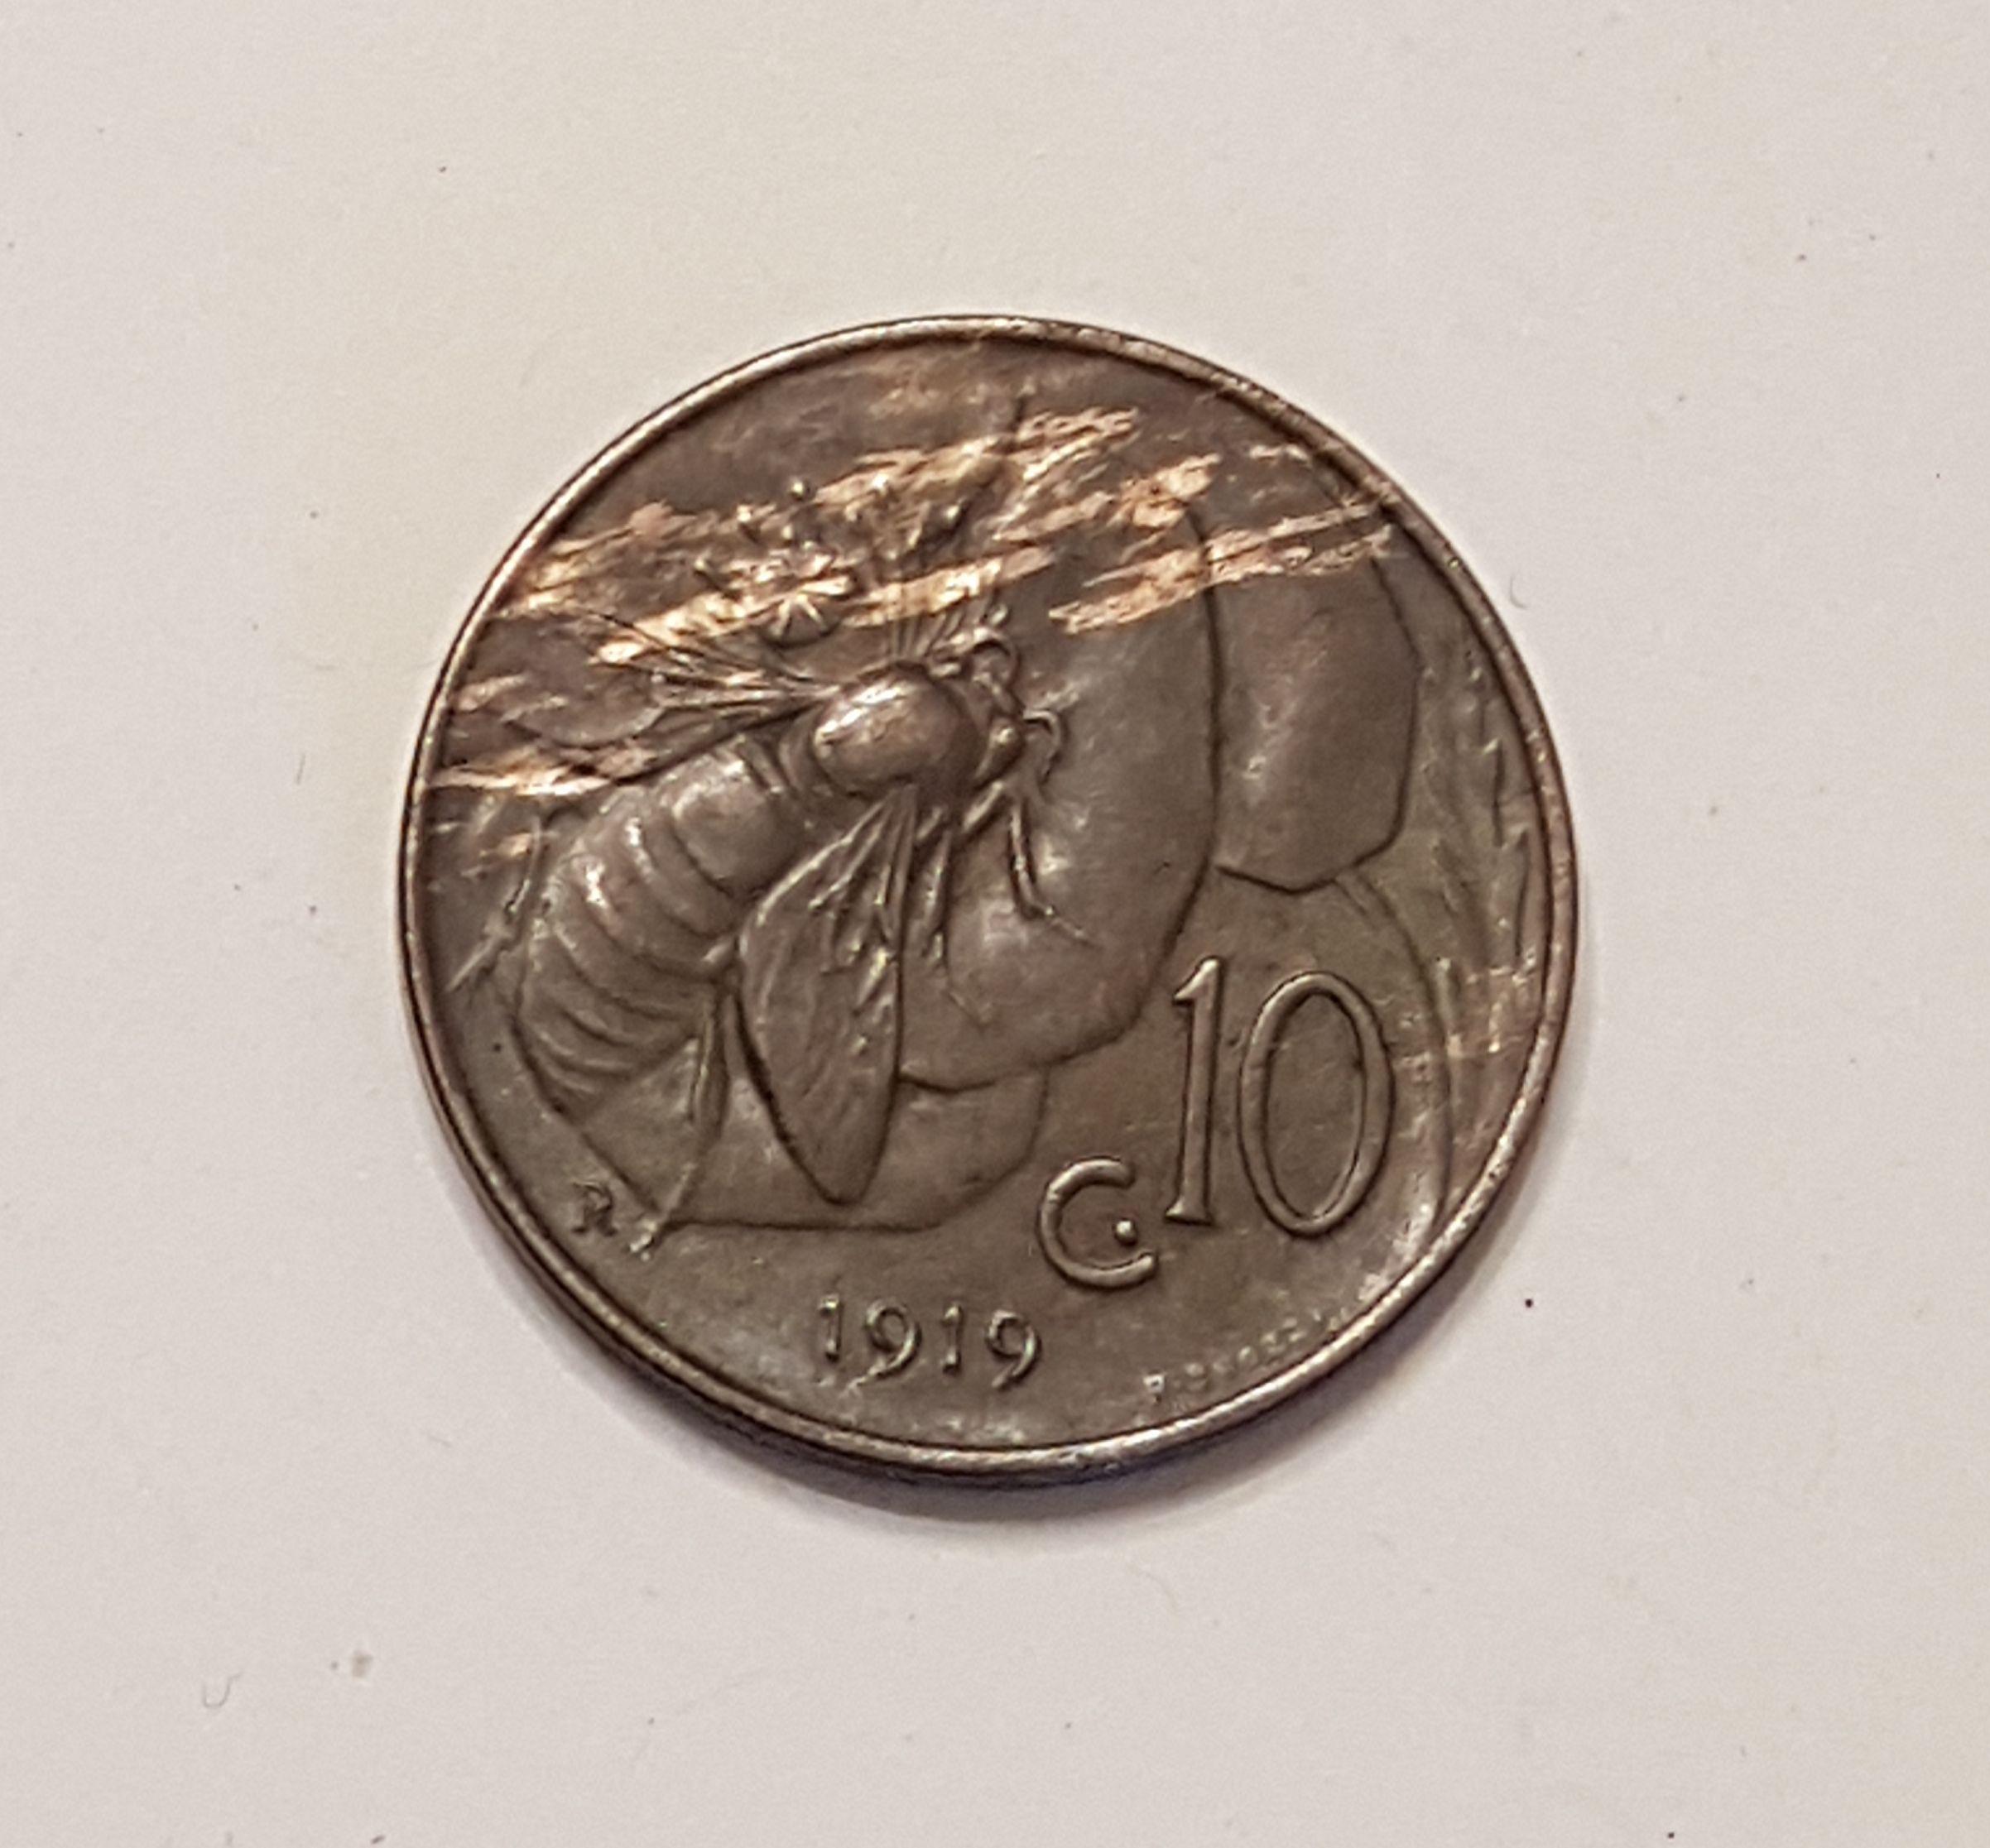 618c19c30a 10 centesimi 1919 ape - Regno d'Italia: identificazioni, valutazioni ...